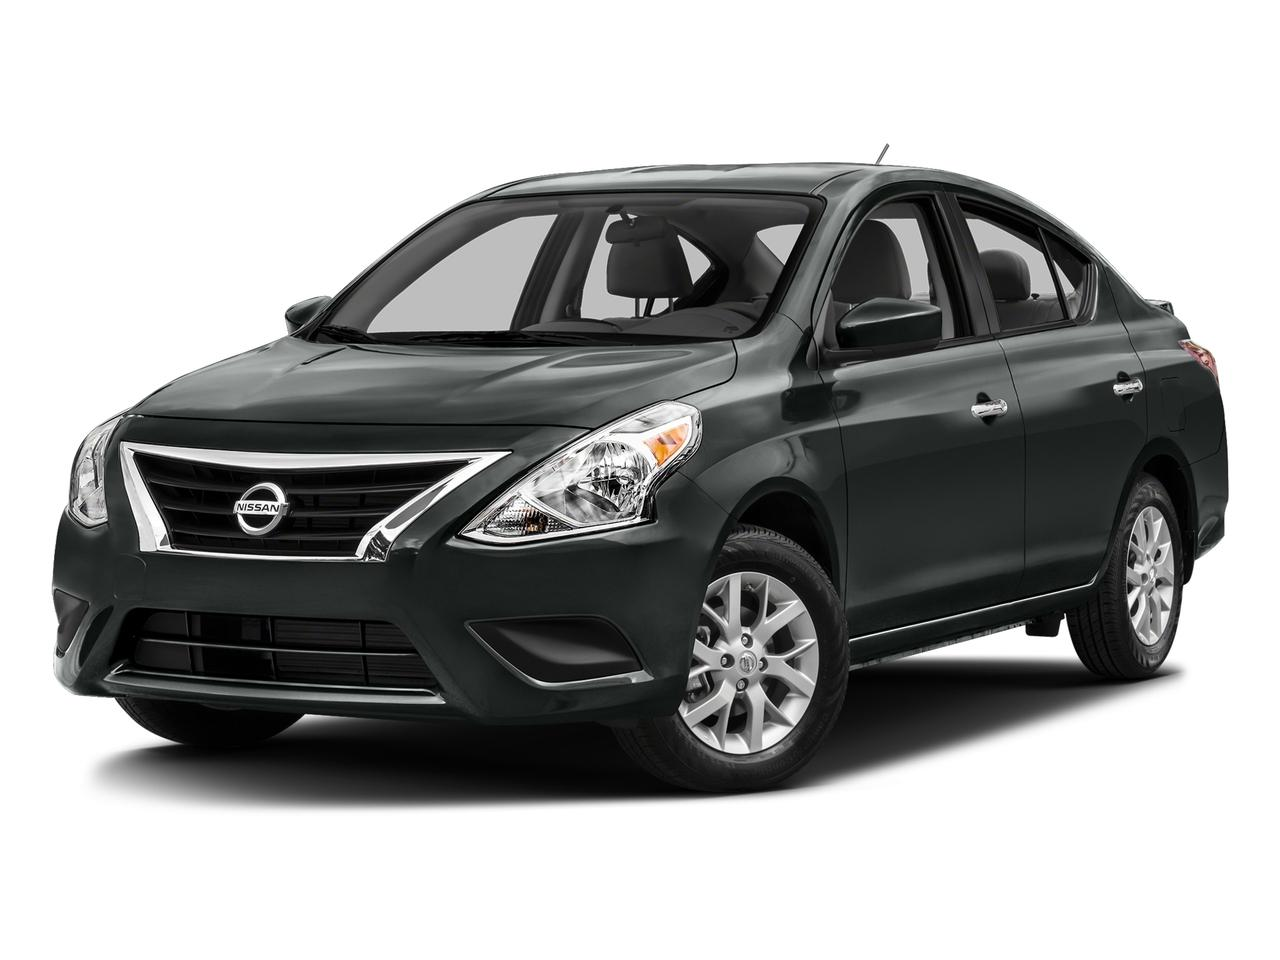 2017 Nissan Versa Sedan Vehicle Photo in Owensboro, KY 42303